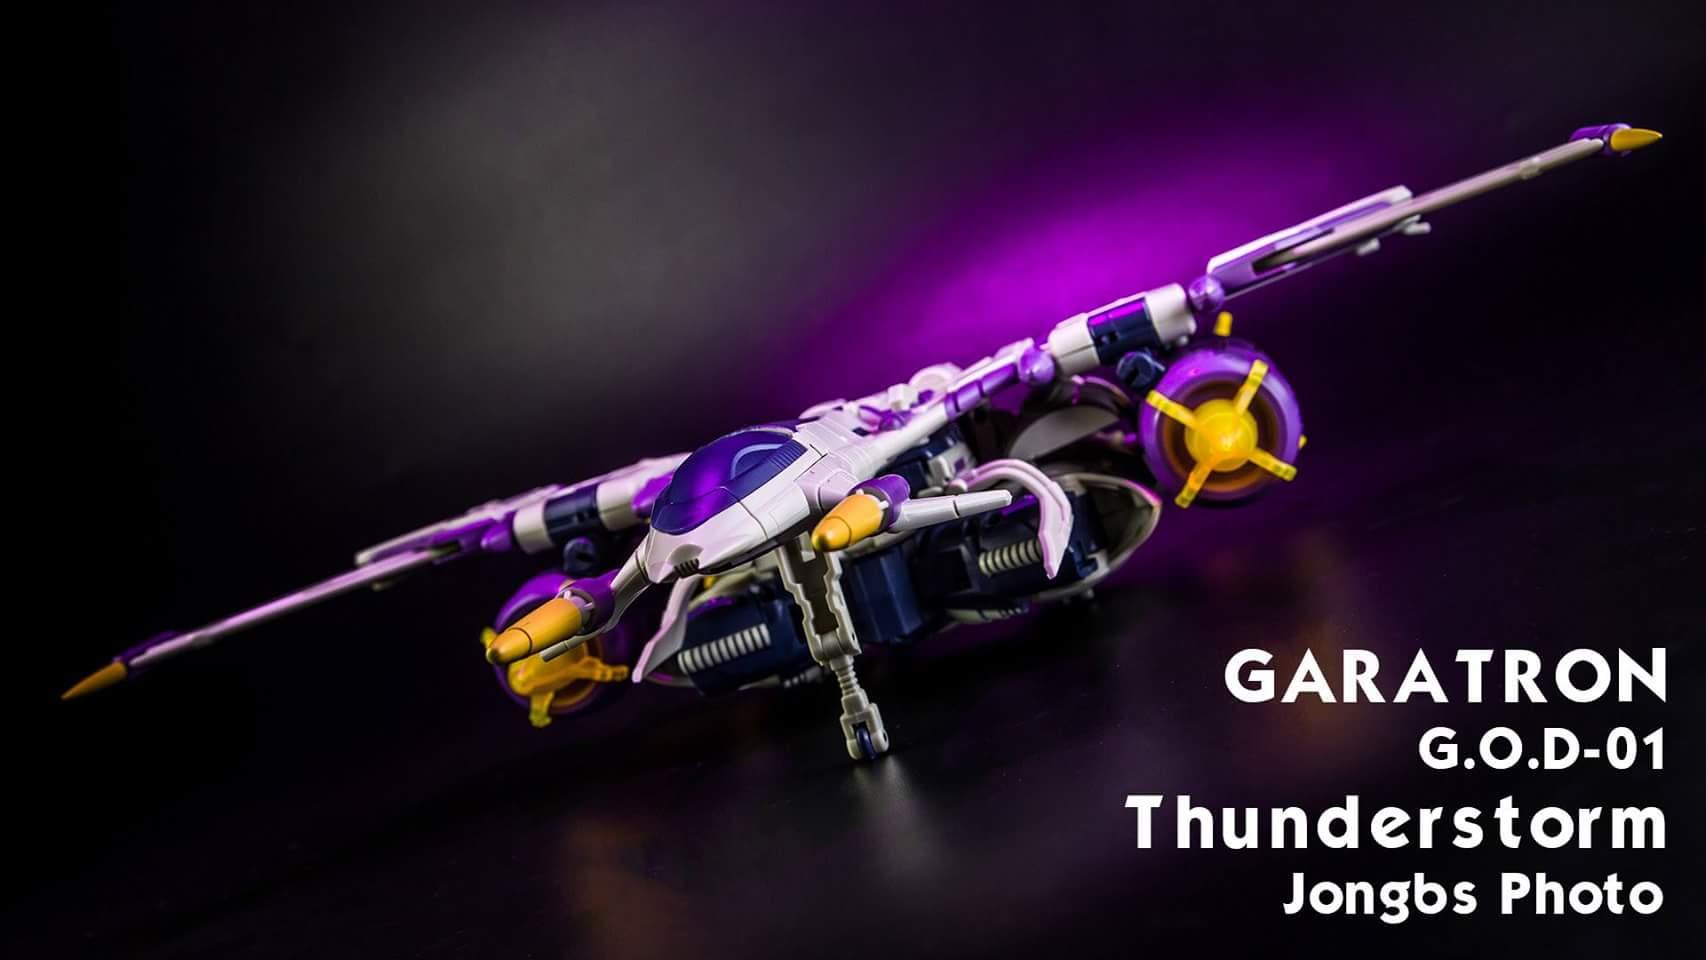 [Garatron] Produit Tiers - Gand of Devils G.O.D-01 Thunderstorm - aka Thunderwing des BD TF d'IDW - Page 2 CMrnuiUn